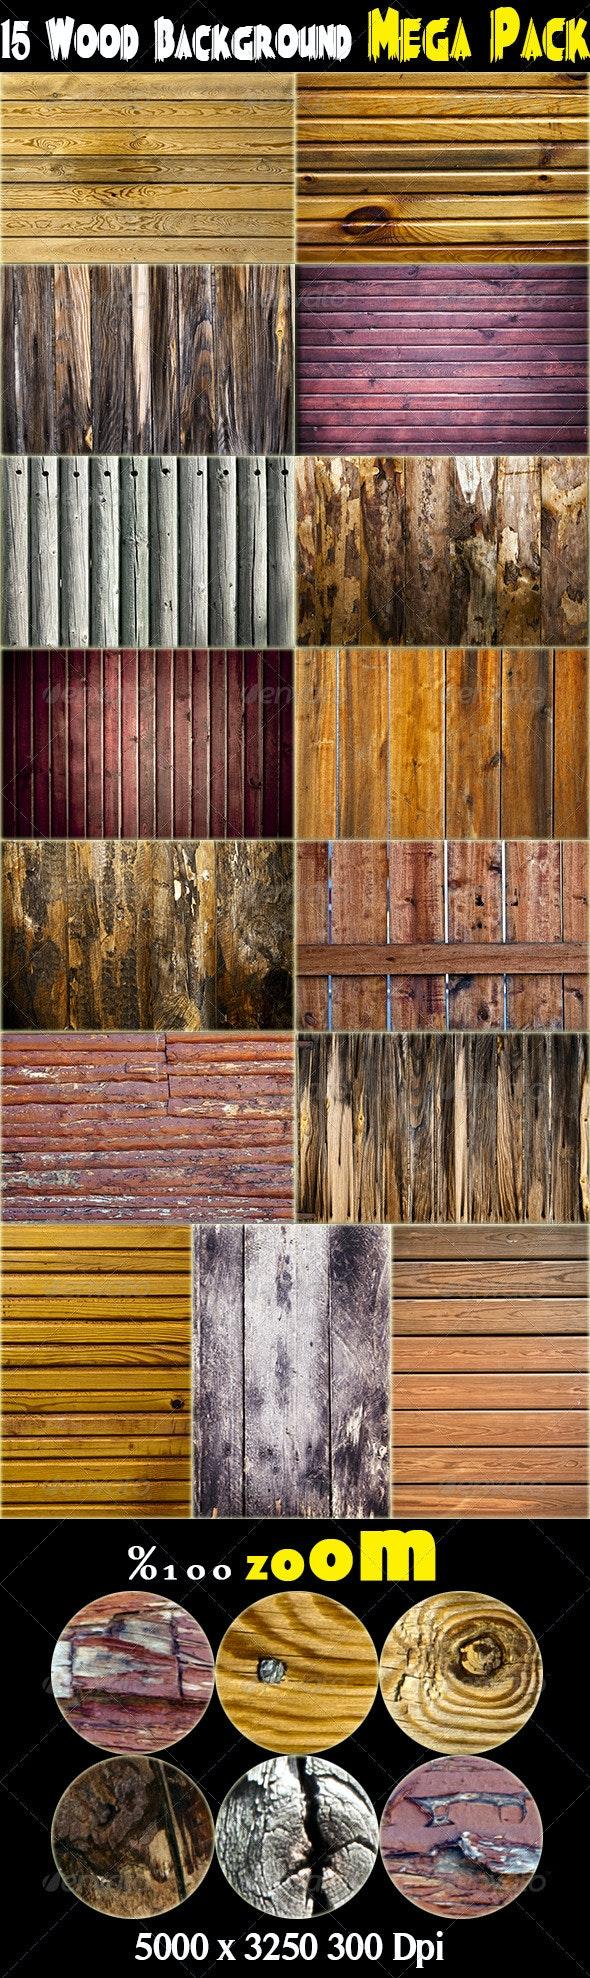 15 Wood Background Mega Pack - Wood Textures